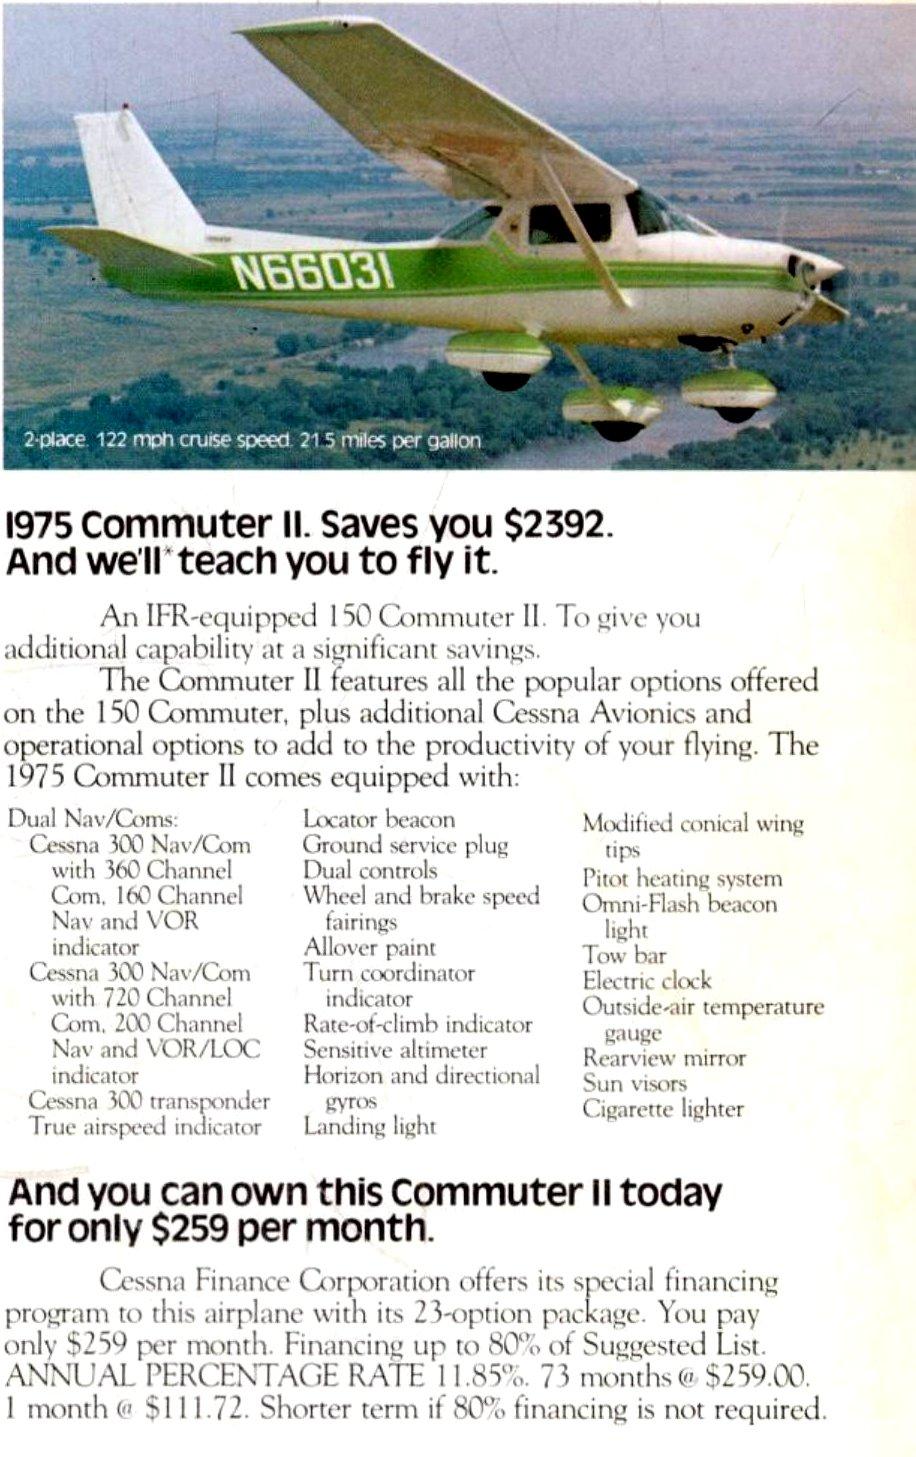 1975 Cessna Commuter II